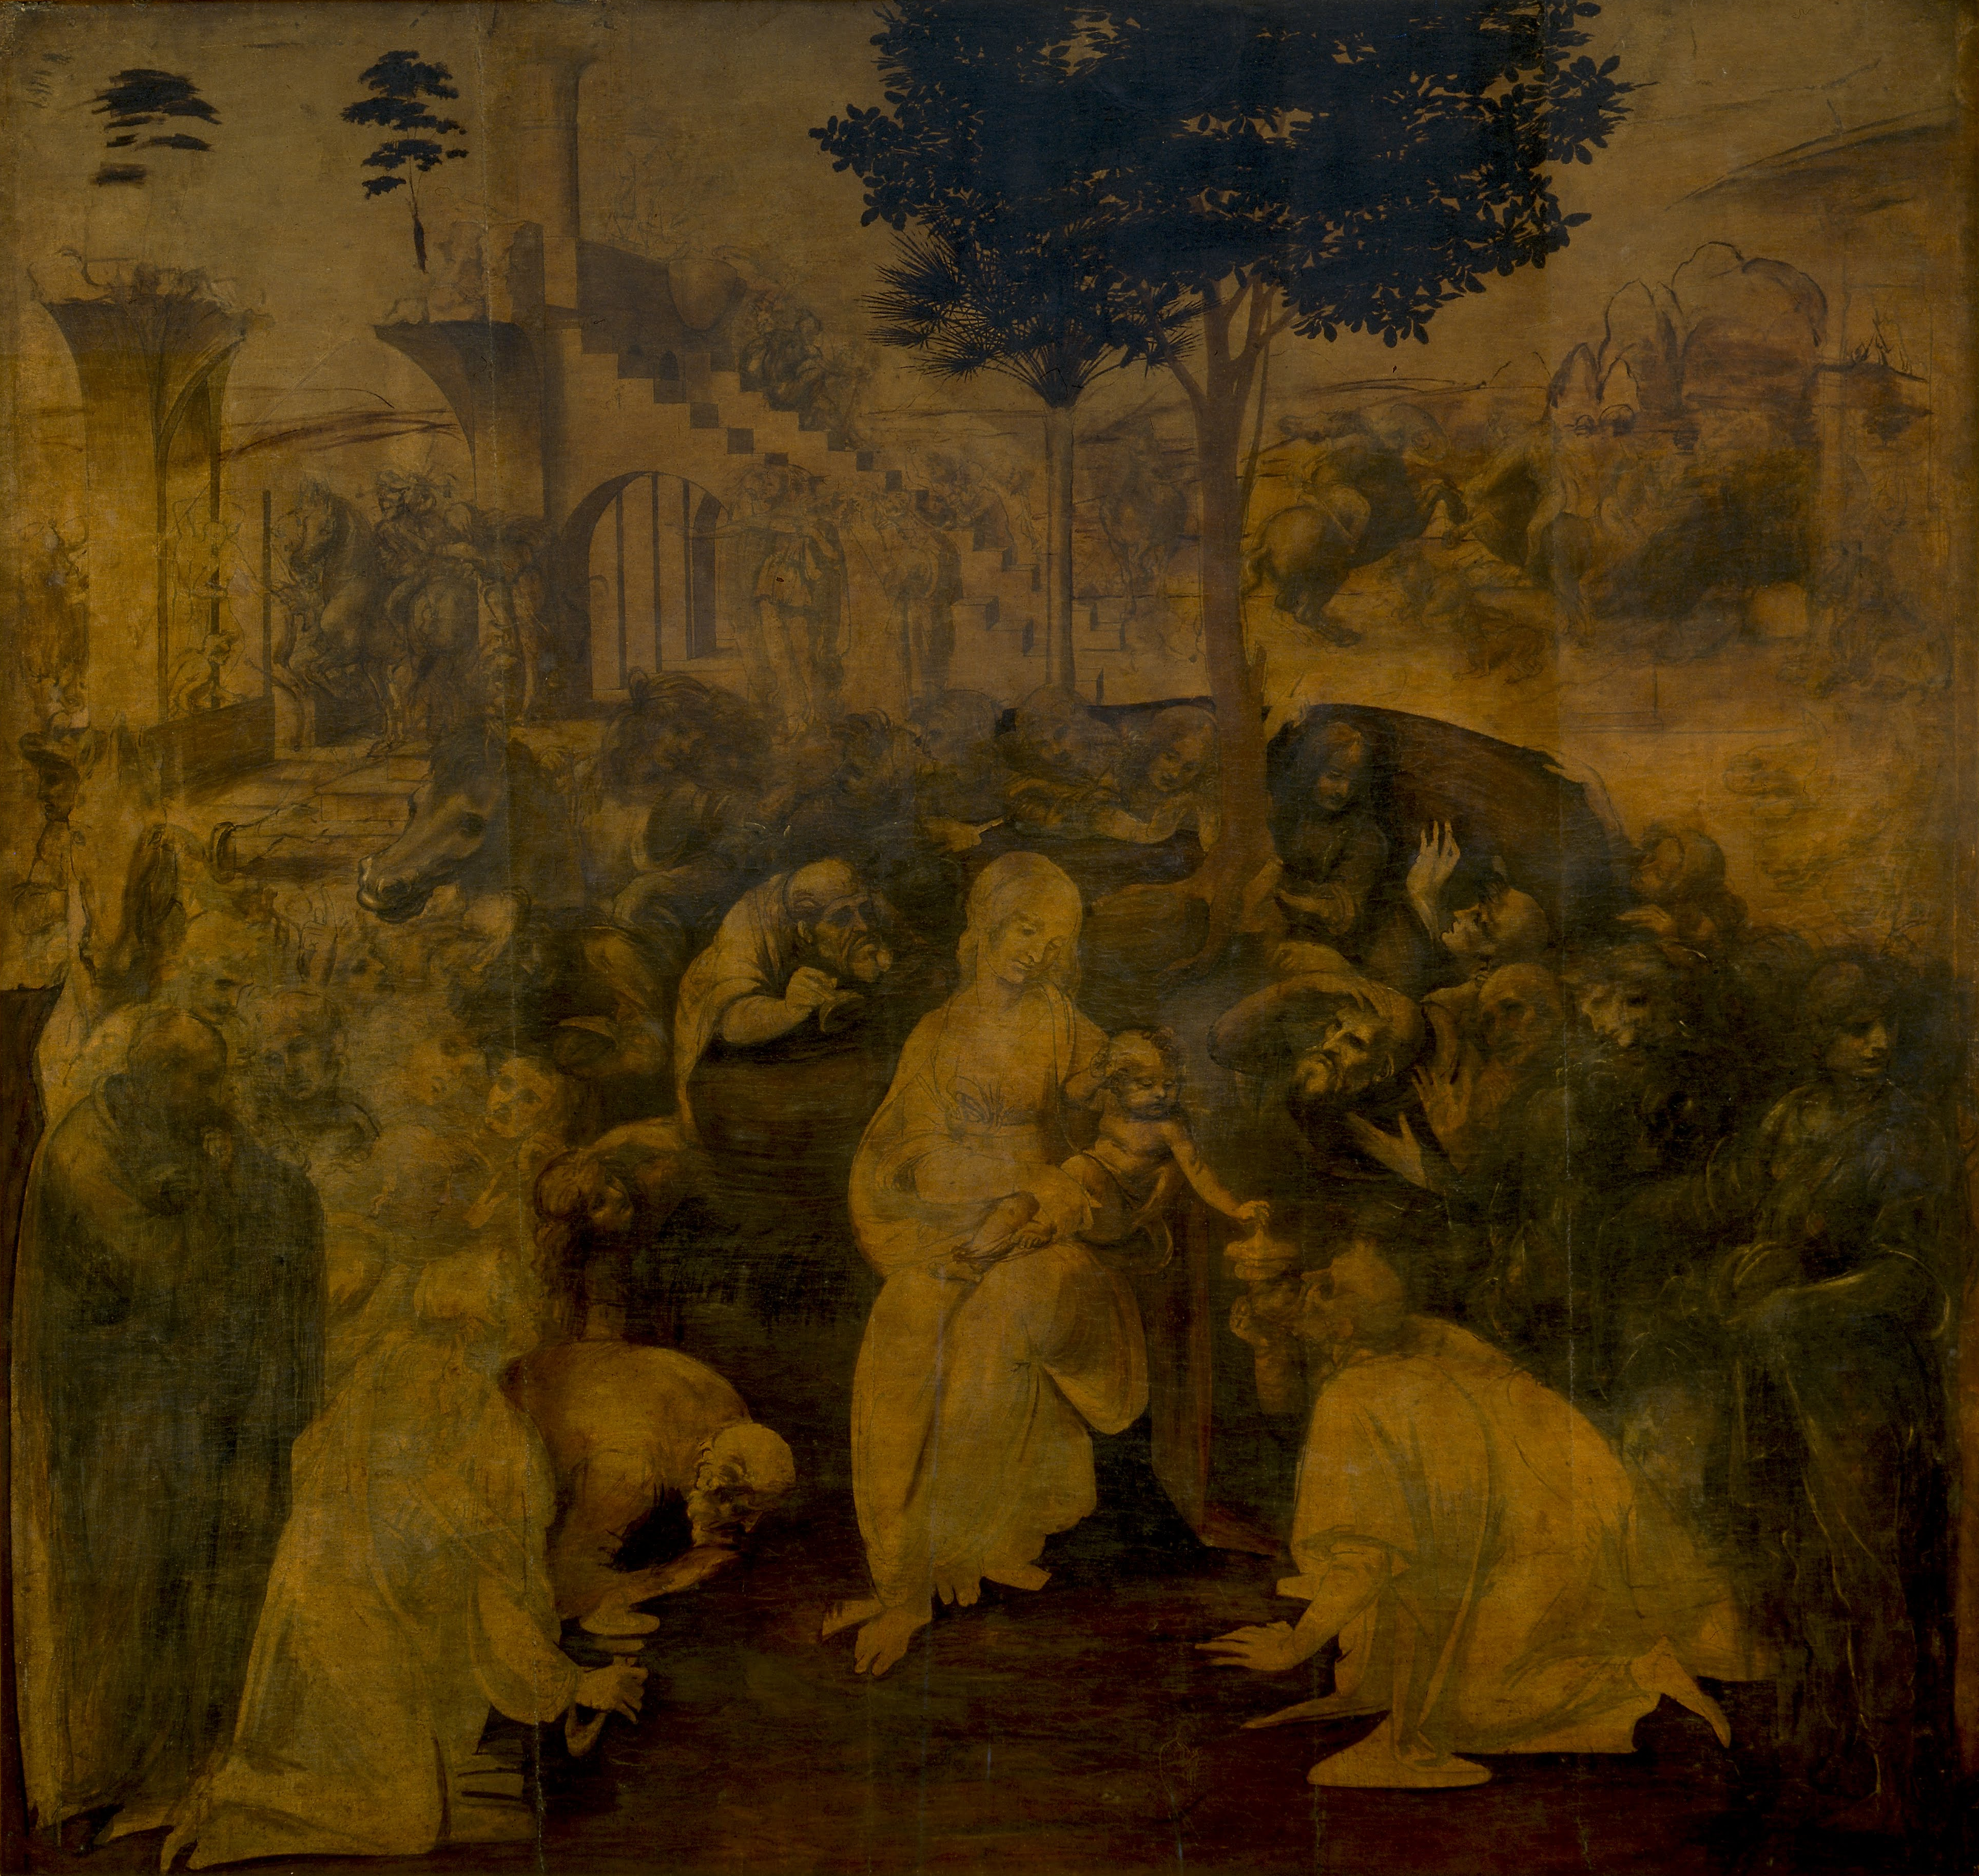 ADORATION OF THE MAGI, Leonardo da Vinci